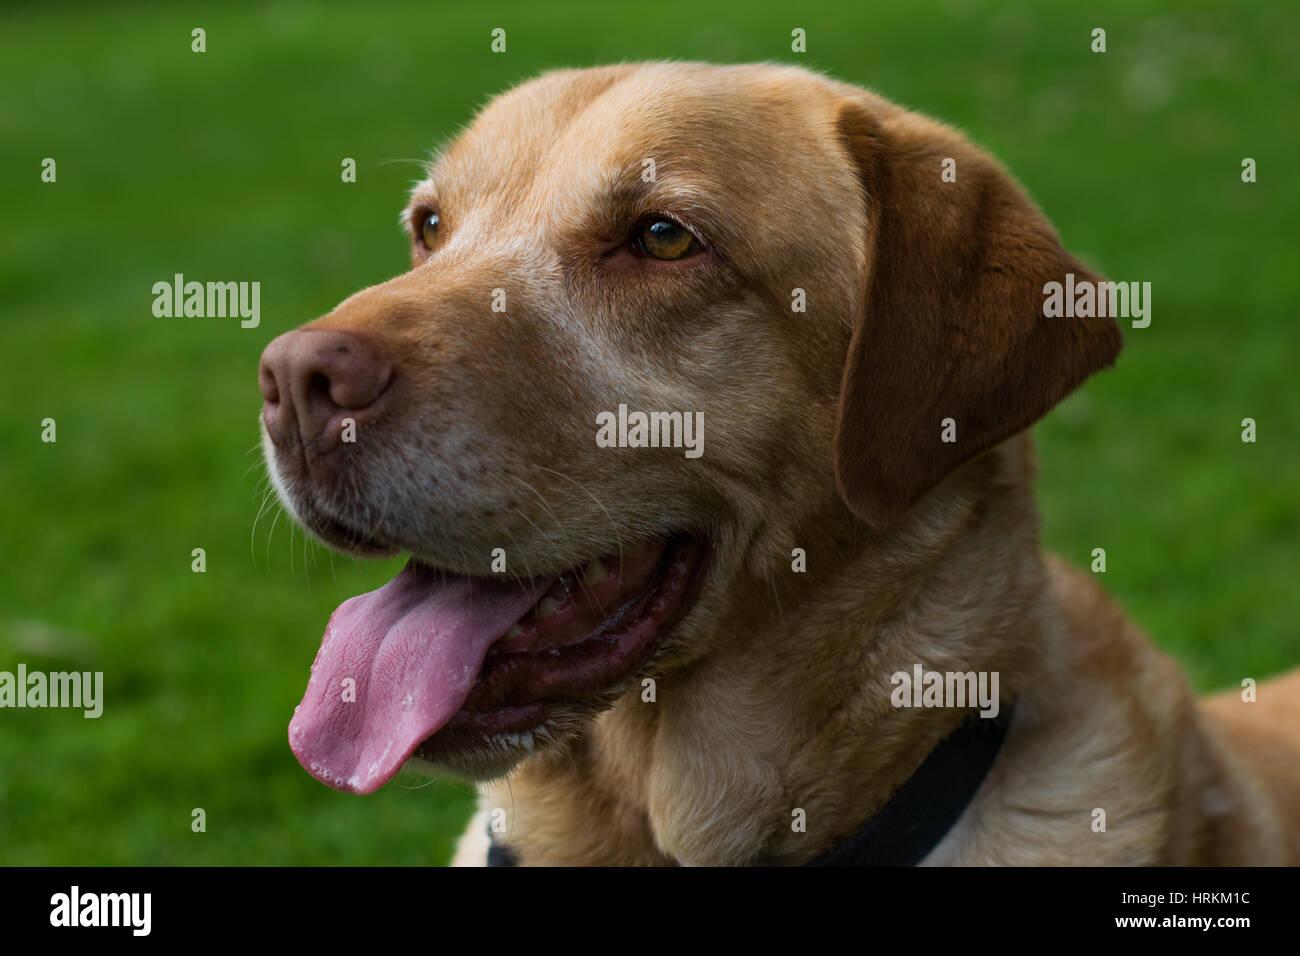 Labrador playing in the garden - Stock Image